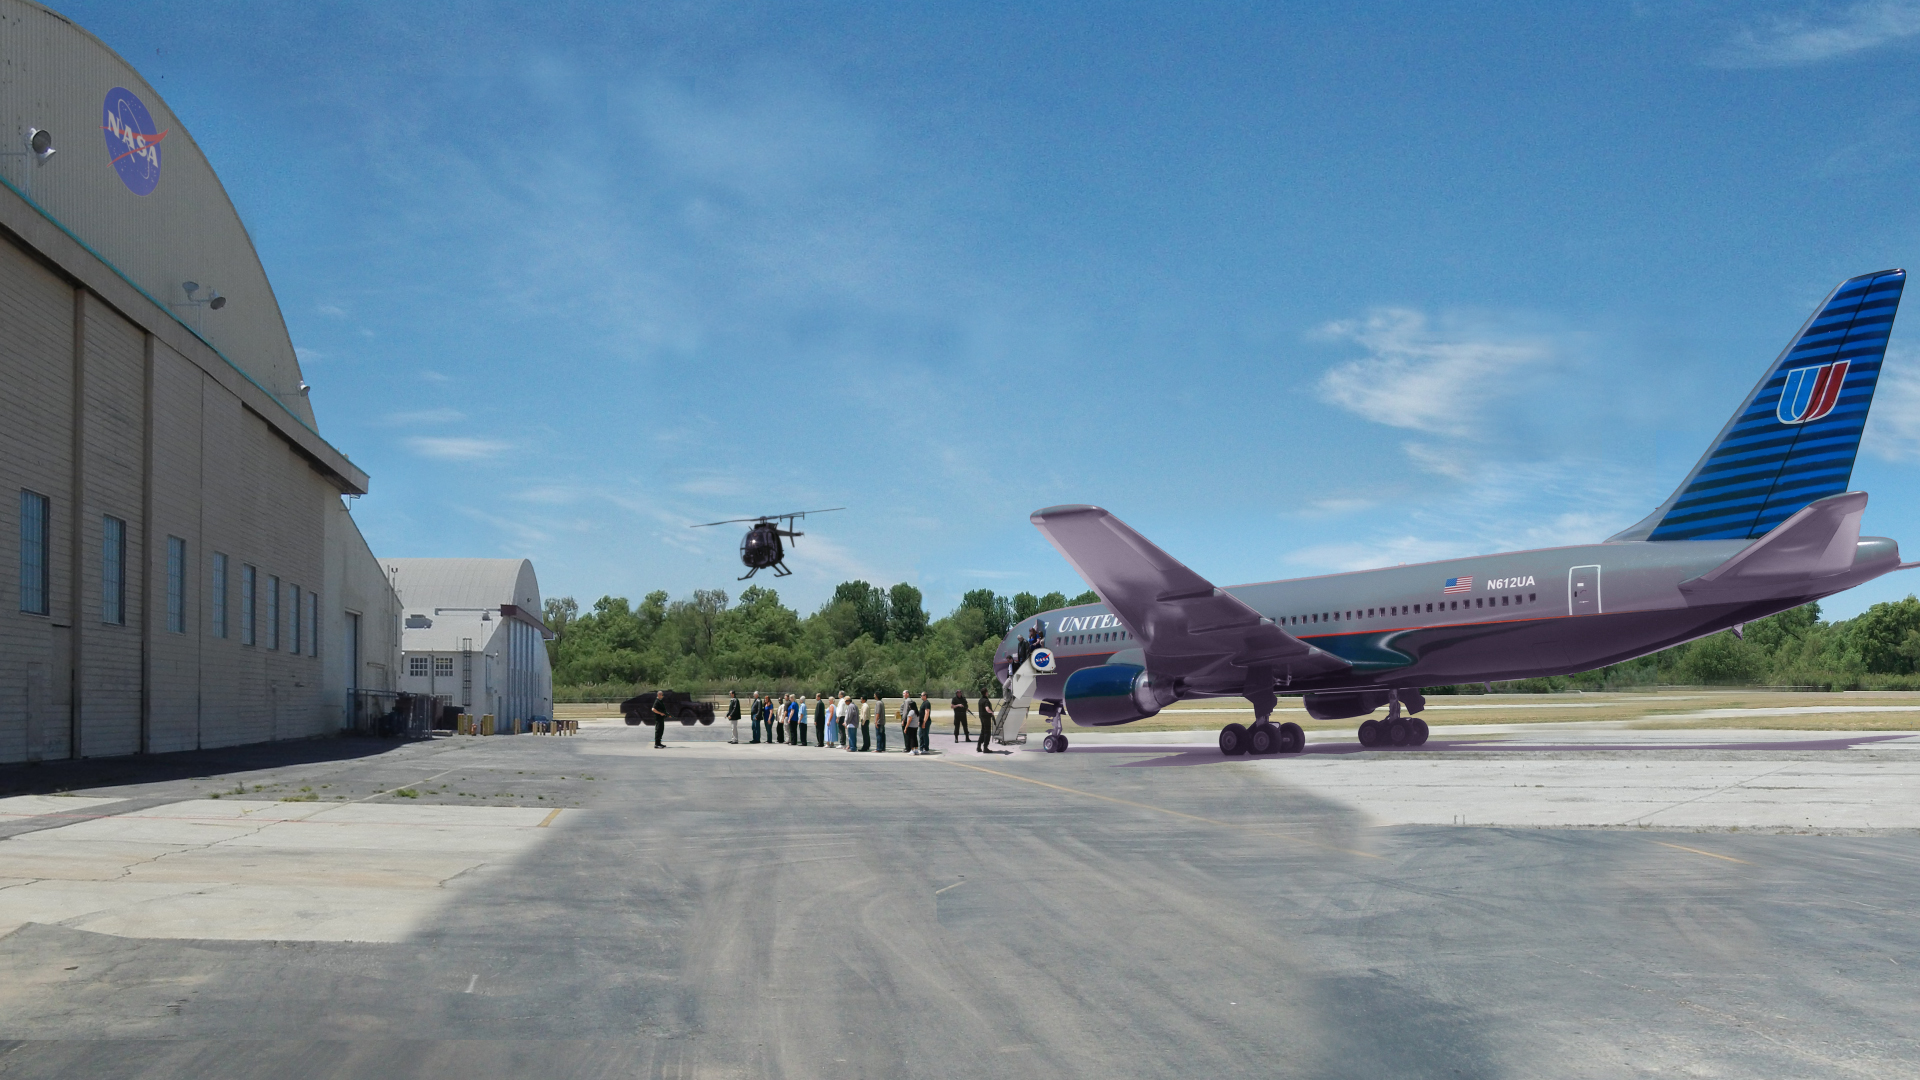 Miniture Building Vehicle Airplane Composite